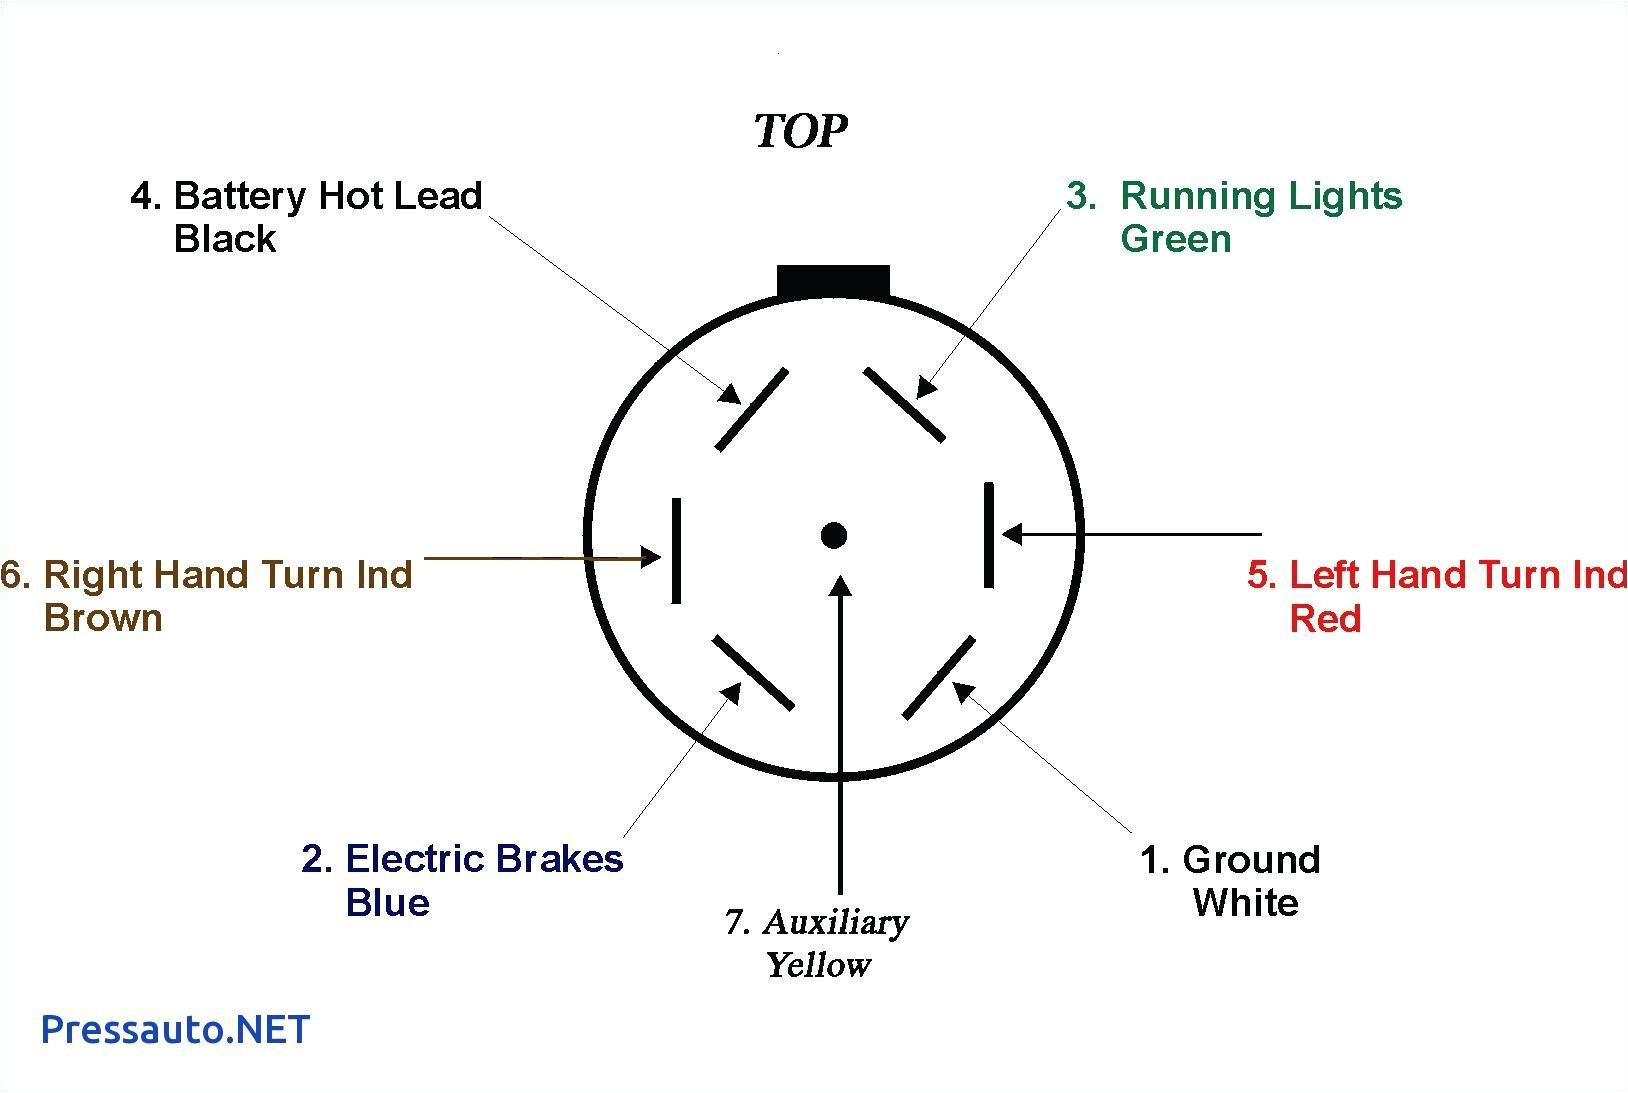 pin pin rv trailer plug wiring on pinterest book diagram schema rv 7 pin trailer wiring for pinterest